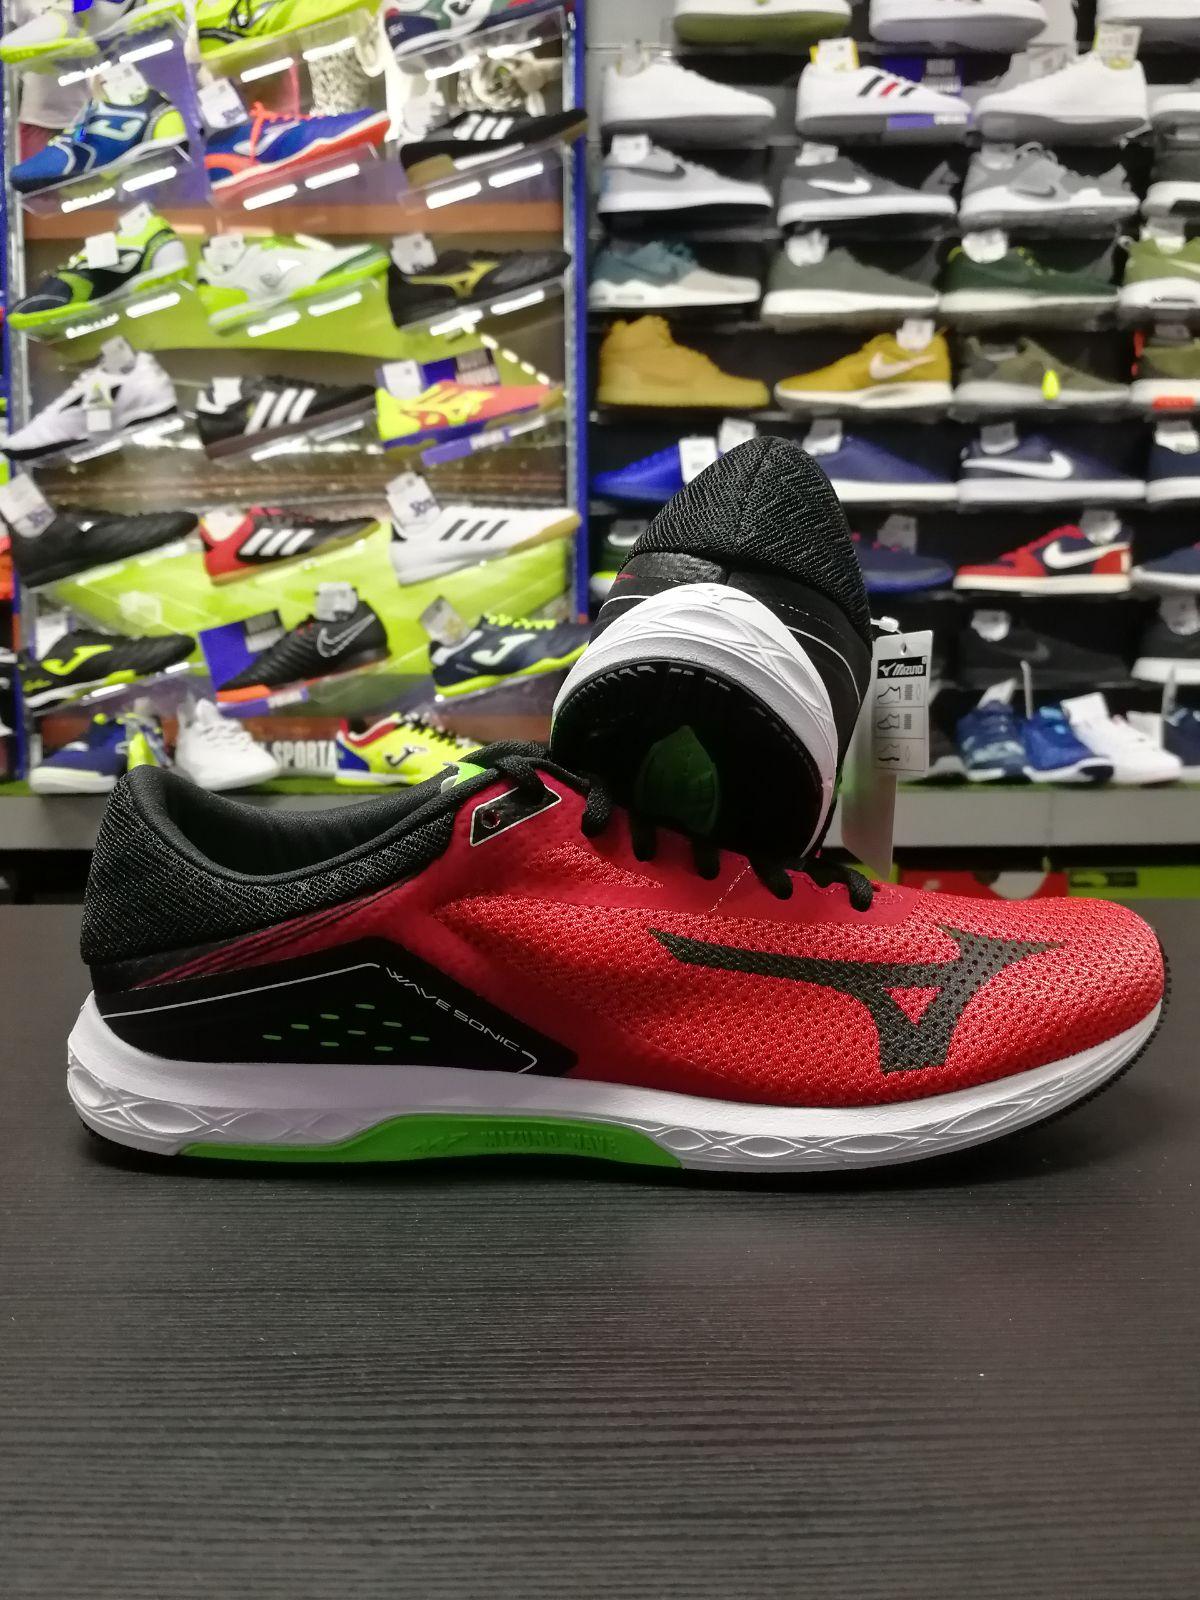 Mizuno Chaussures Baskets De Formateurs Rouge Running Course Wave BvrBn7Z